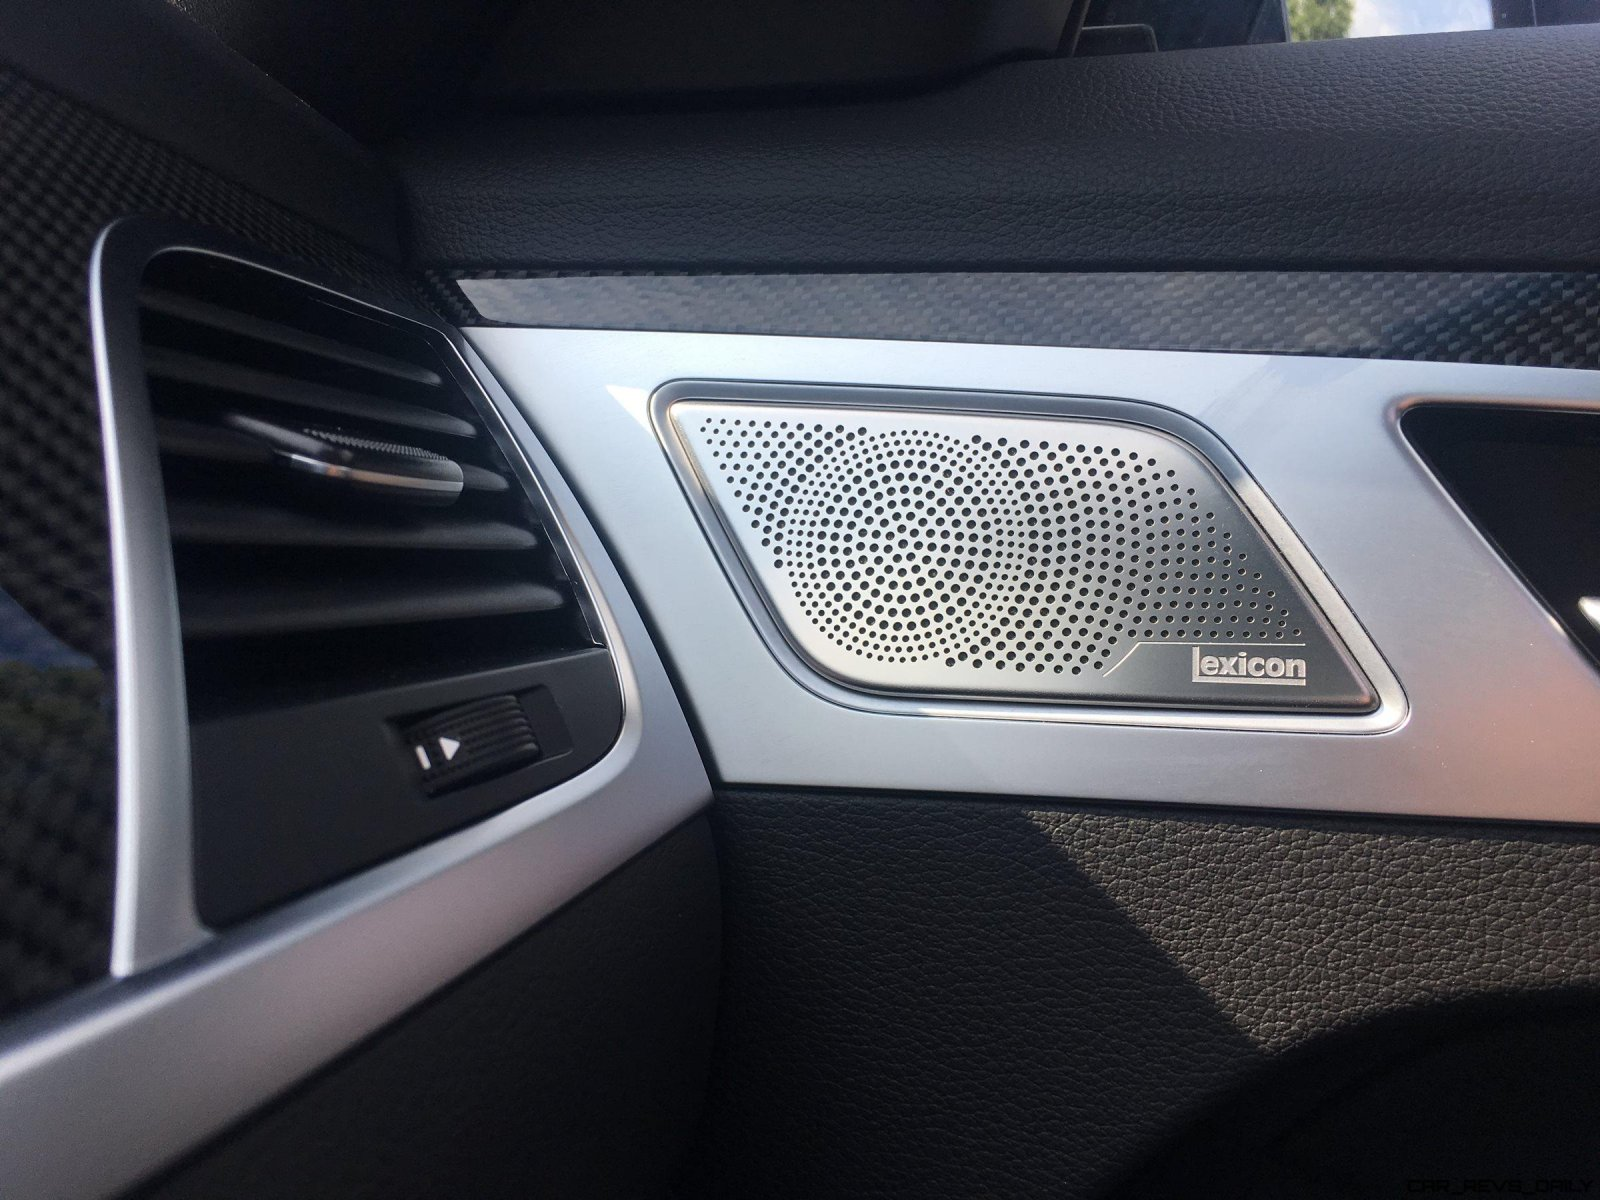 2018 genesis g80 interior.  2018 throughout 2018 genesis g80 interior